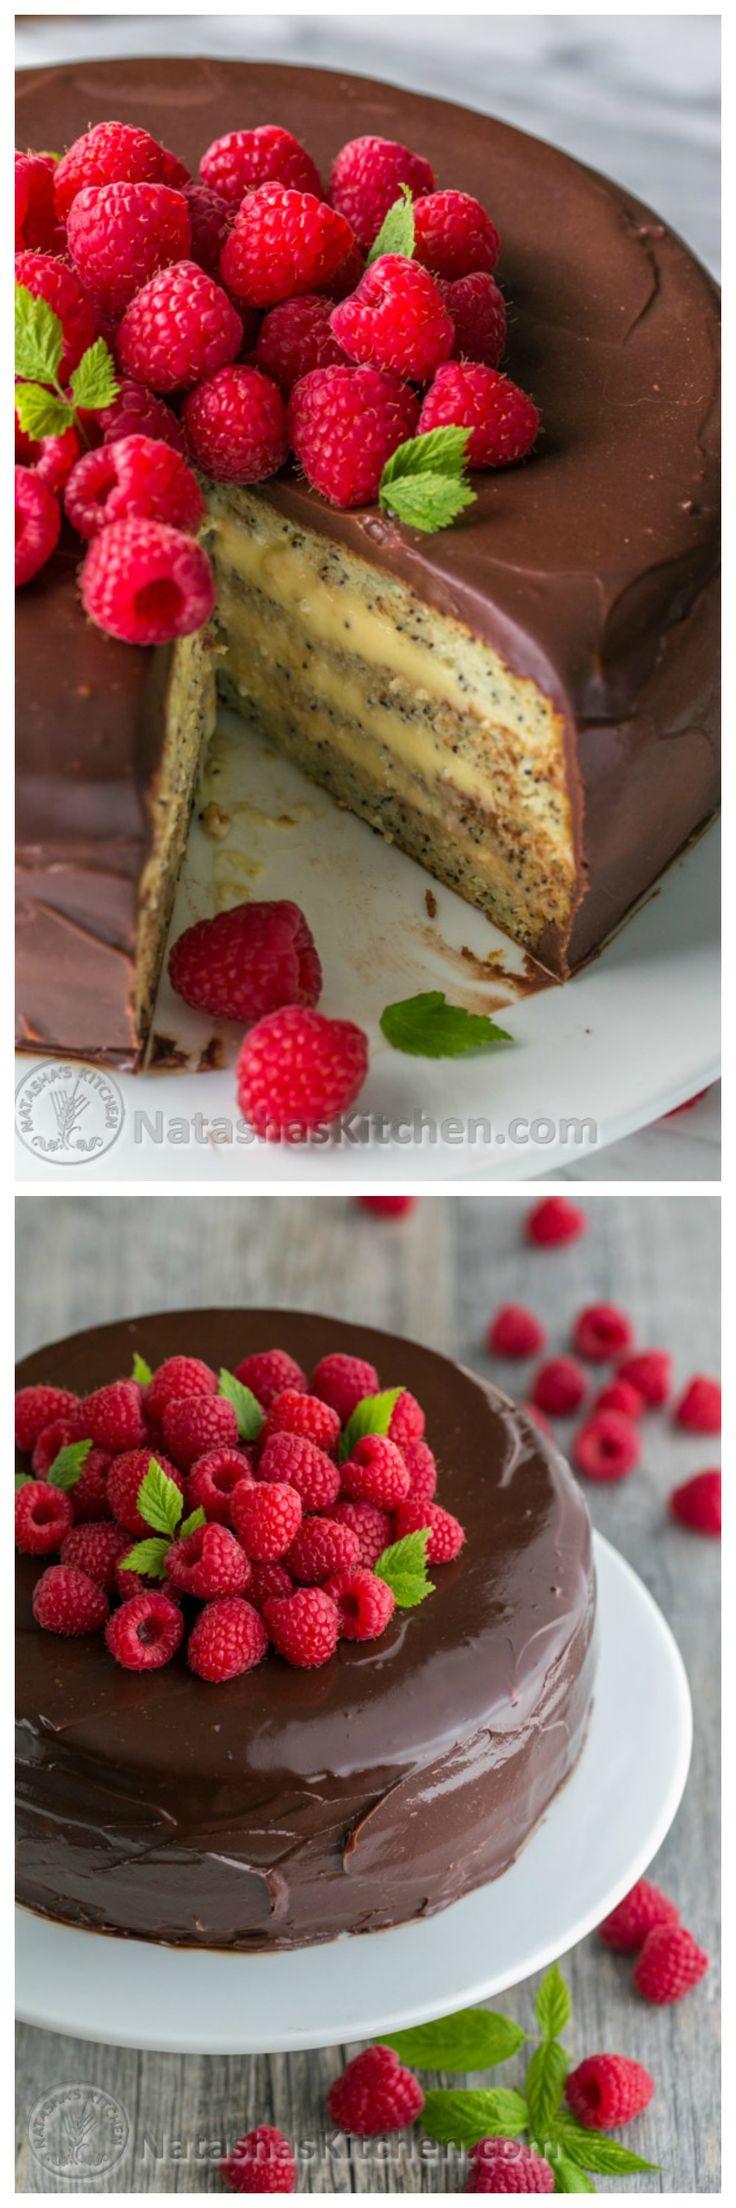 Poppy Seed Sour Cream Cake   NatashasKitchen.com